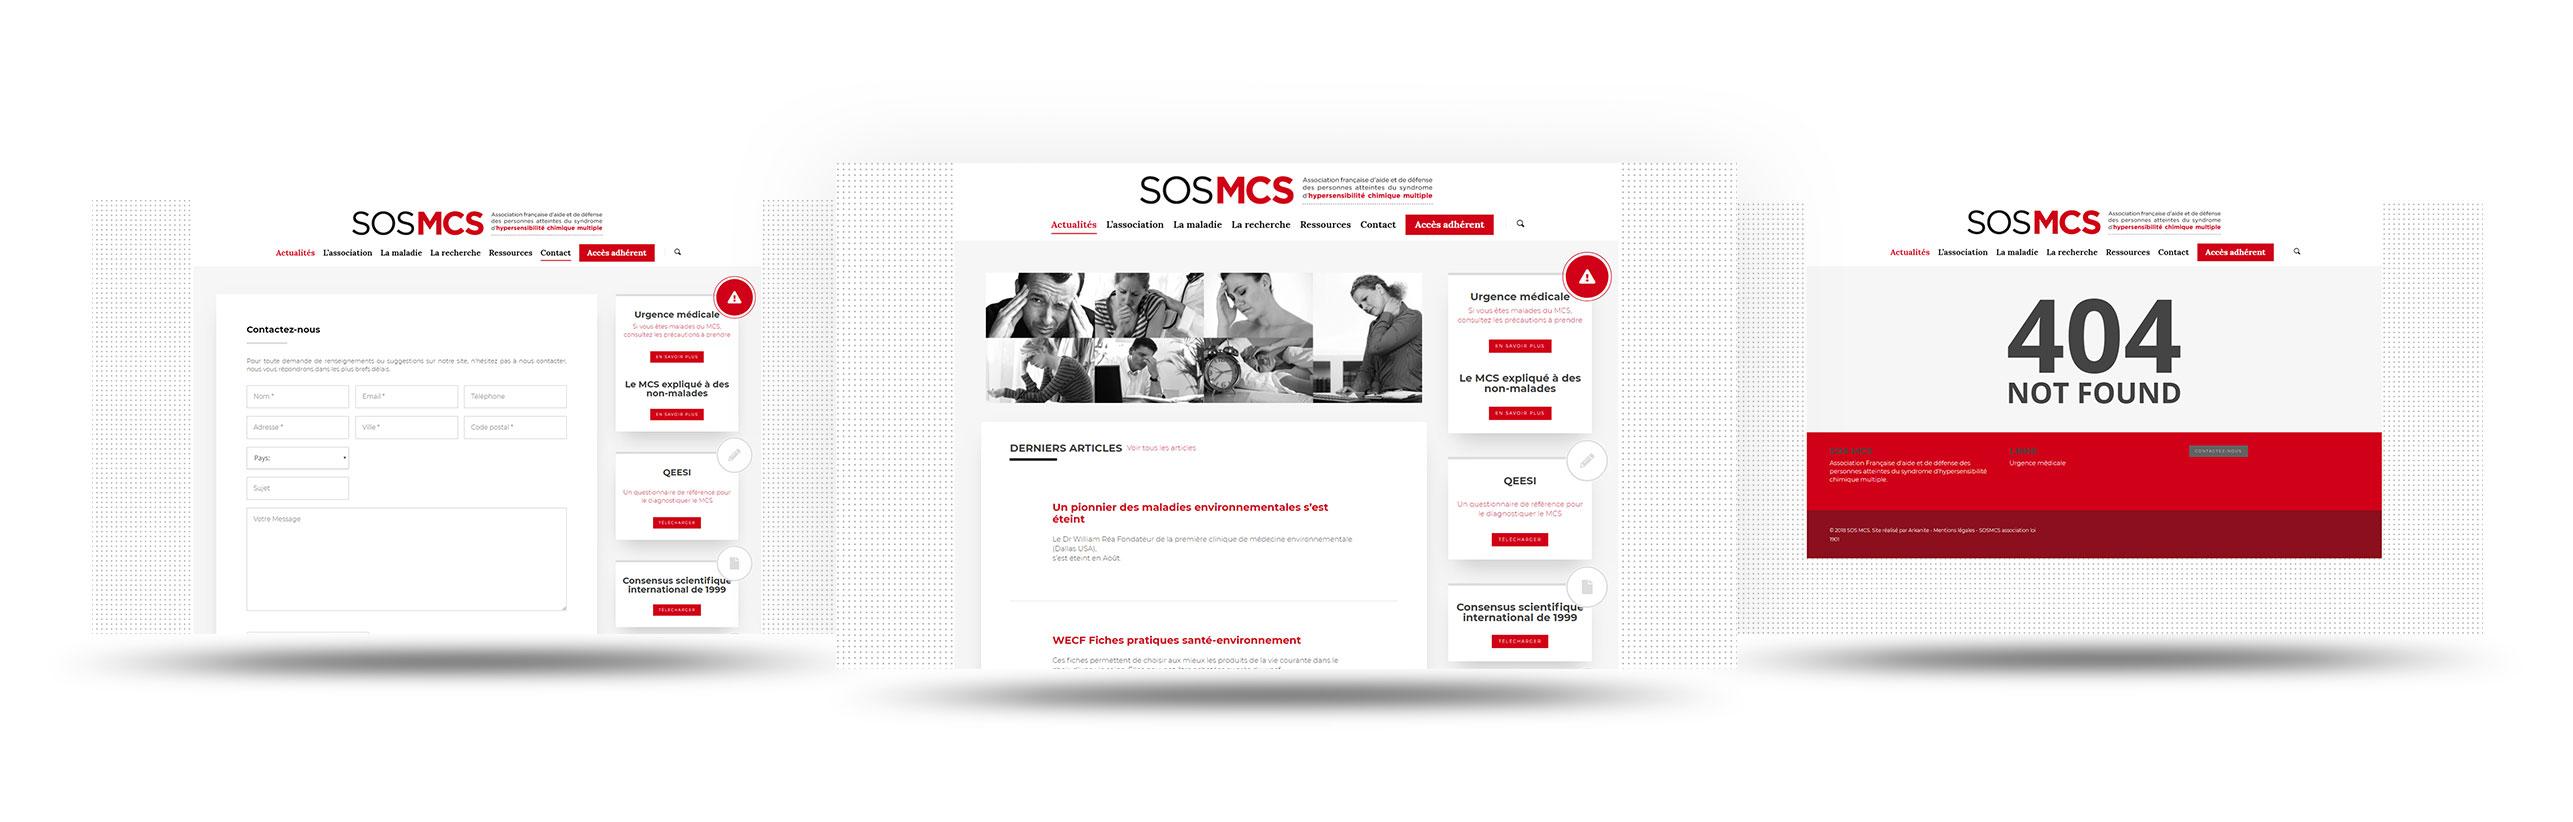 interface pages SOS MCS wordpress agence web design lyon arkanite developpement application mobile graphisme logo icones illustration ecommerce boutique en ligne